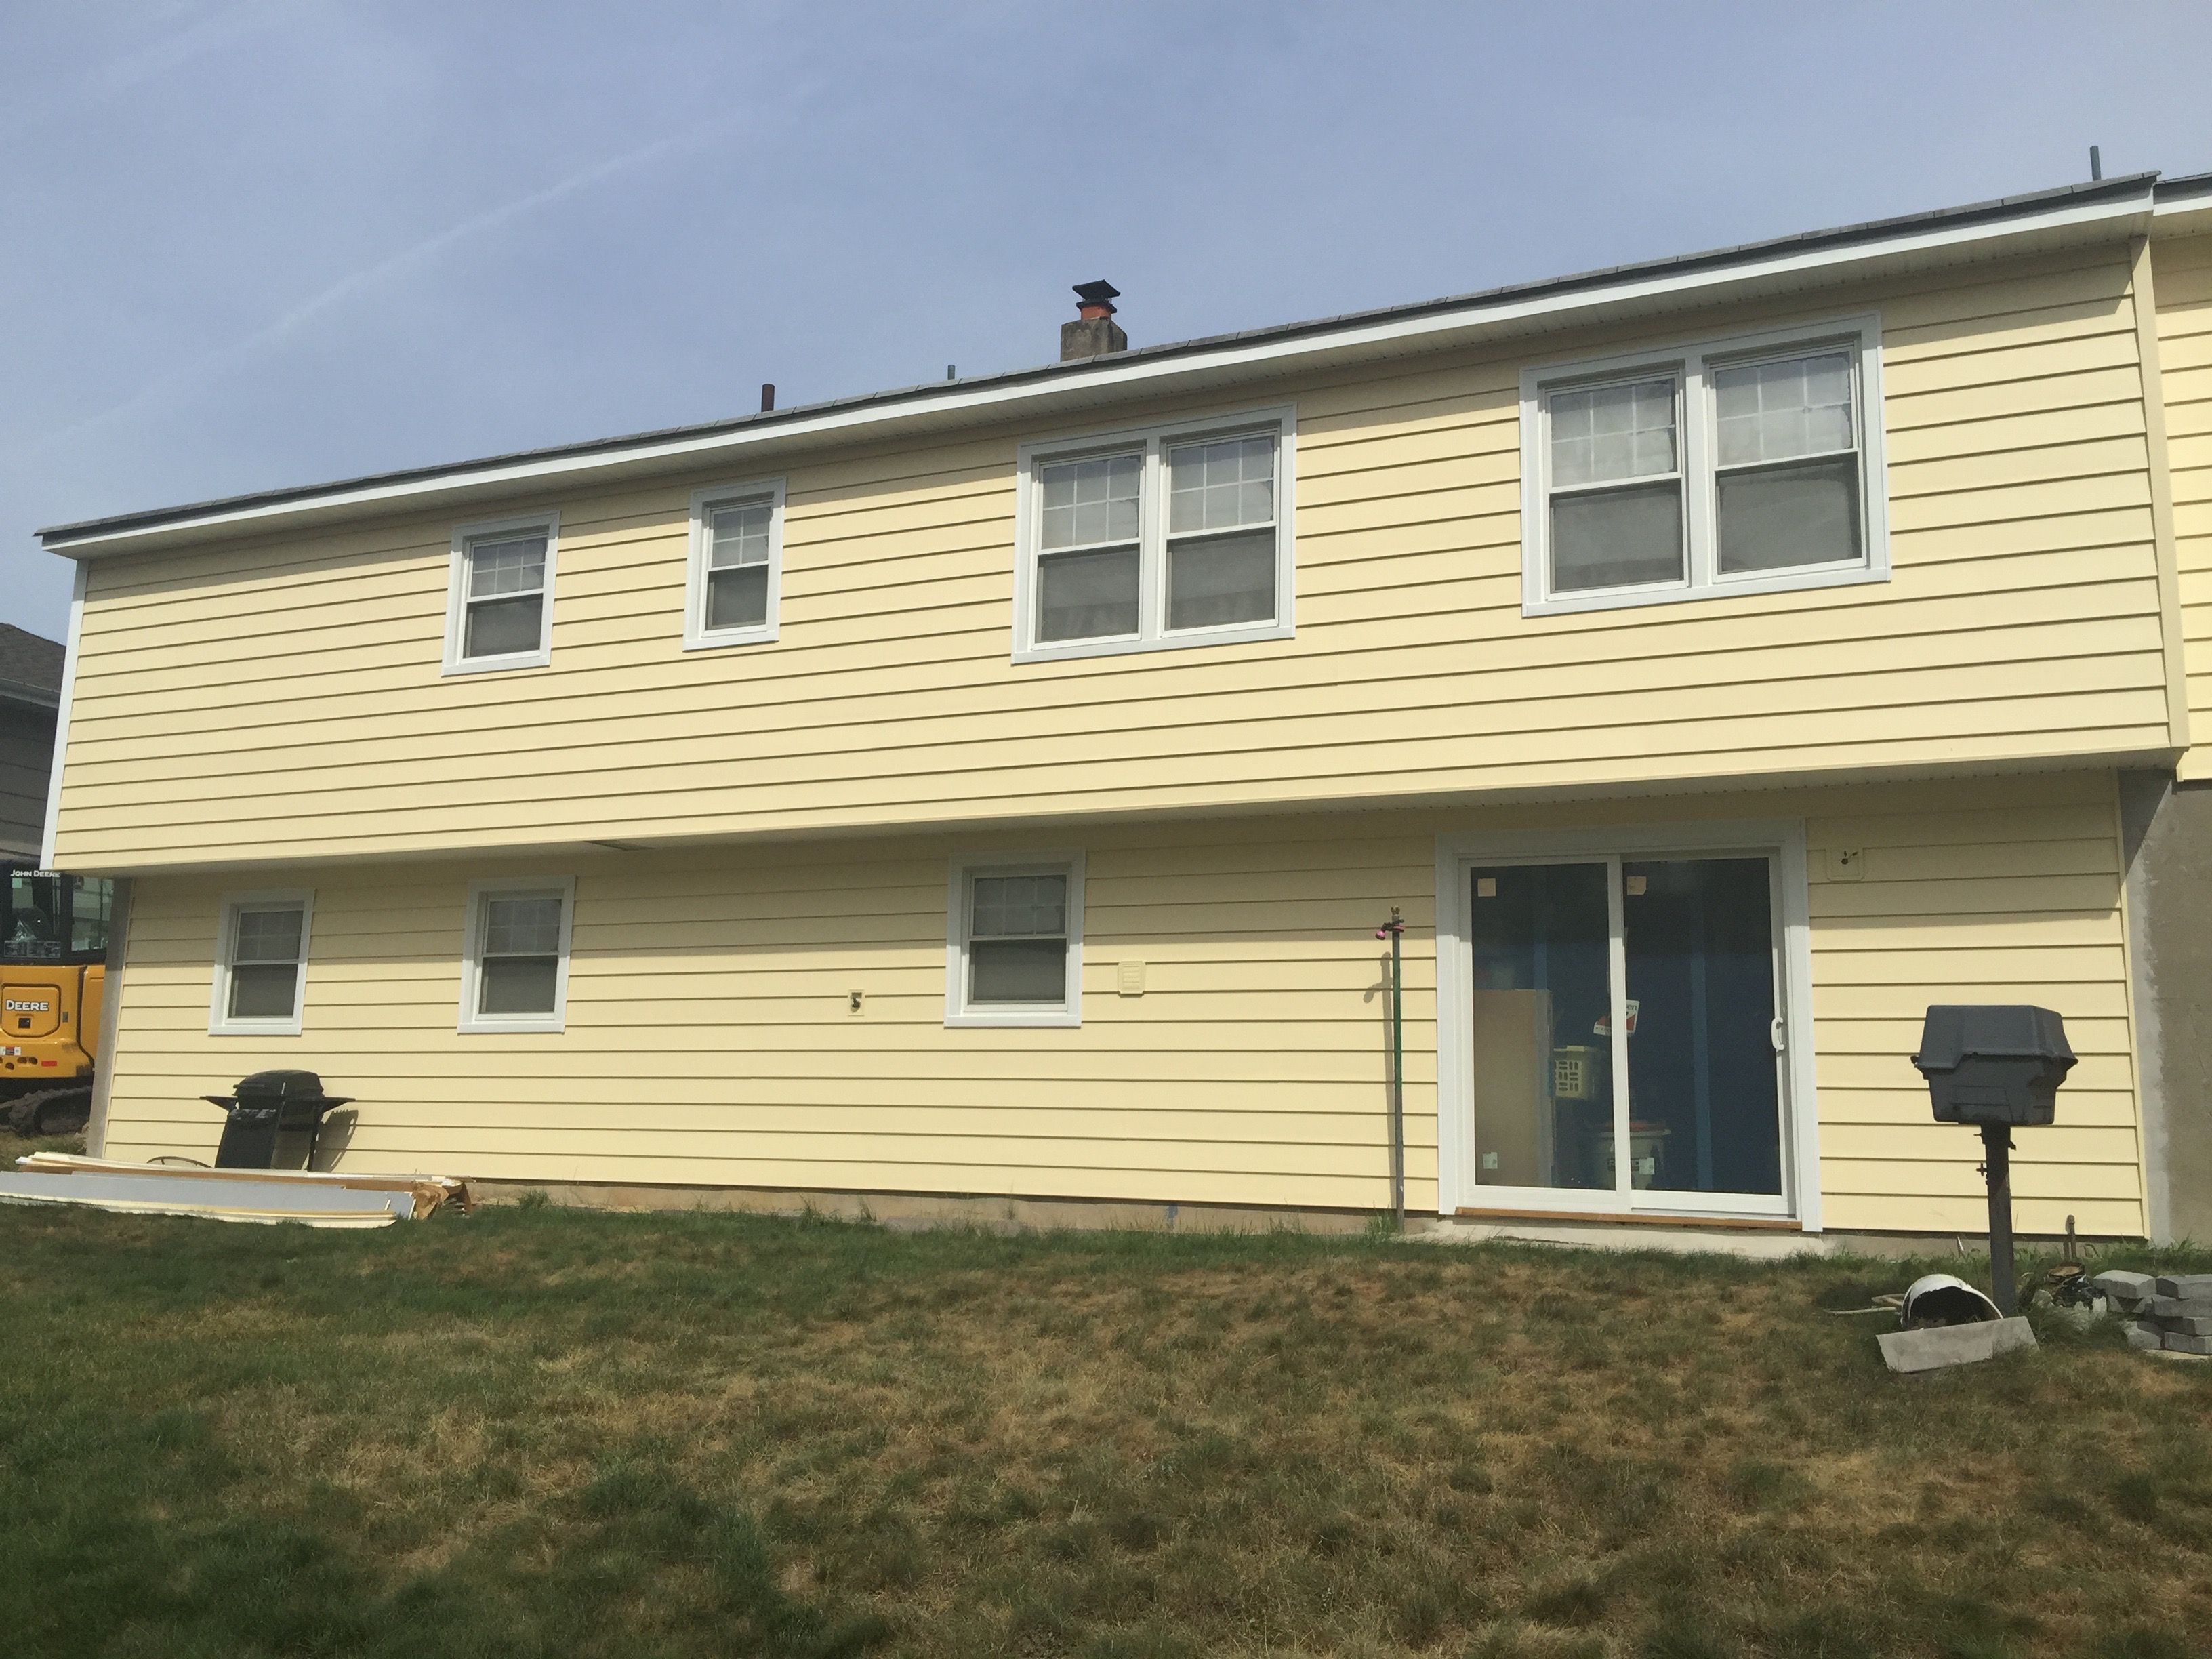 Why Old Tappan Nj Houses Prefer Affordable Vinyl Siding 973 487 3704 Exterior House Siding Exterior Siding Colors Vinyl Siding